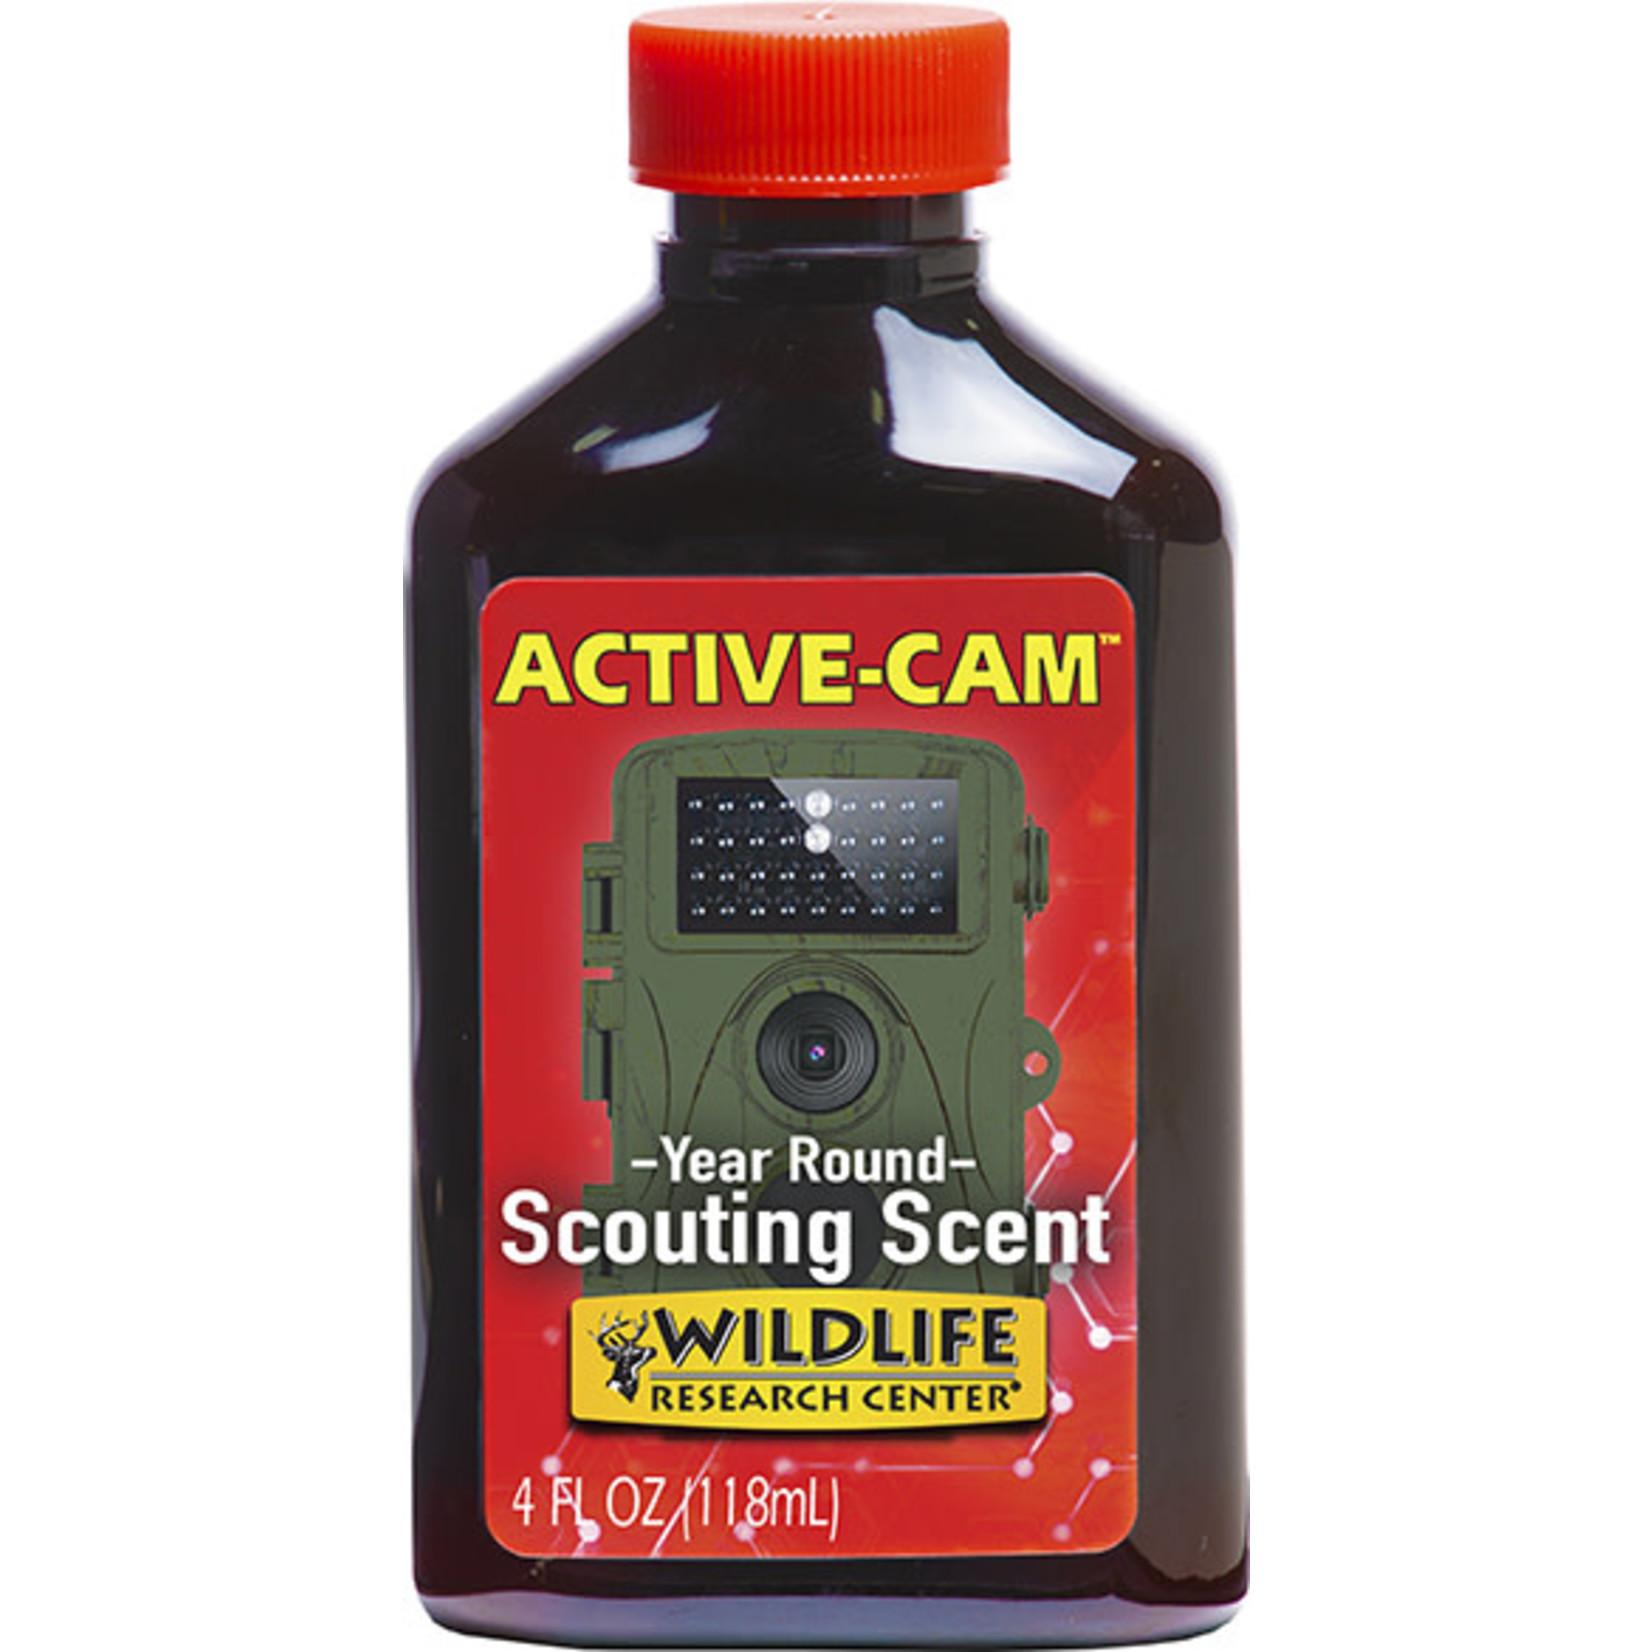 Wildlife Research Center Active-Cam (Trail Camera Scent) 4 FL OZ